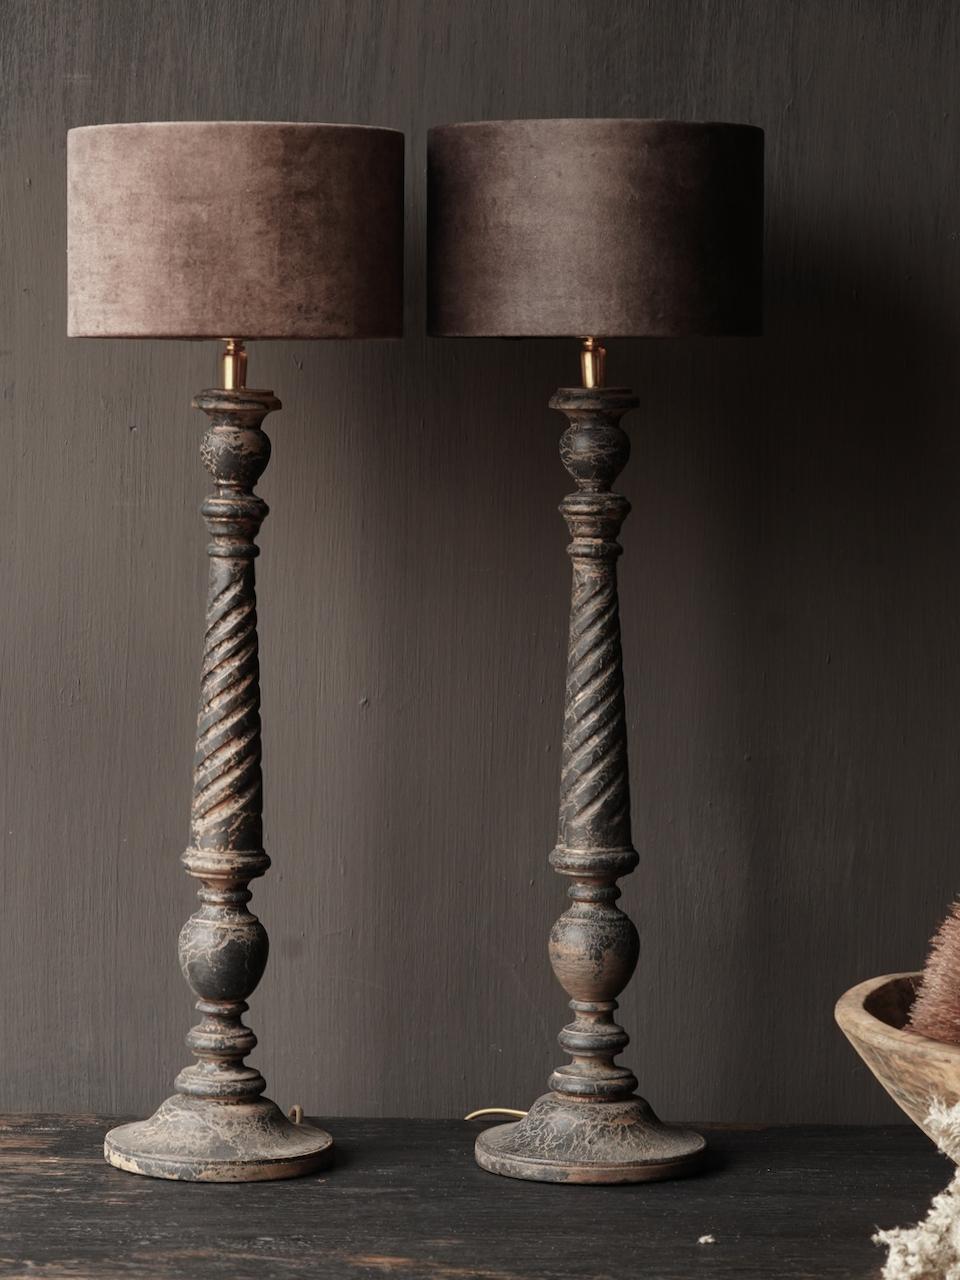 Dark Black / Brown Wooden lamp including shade-2